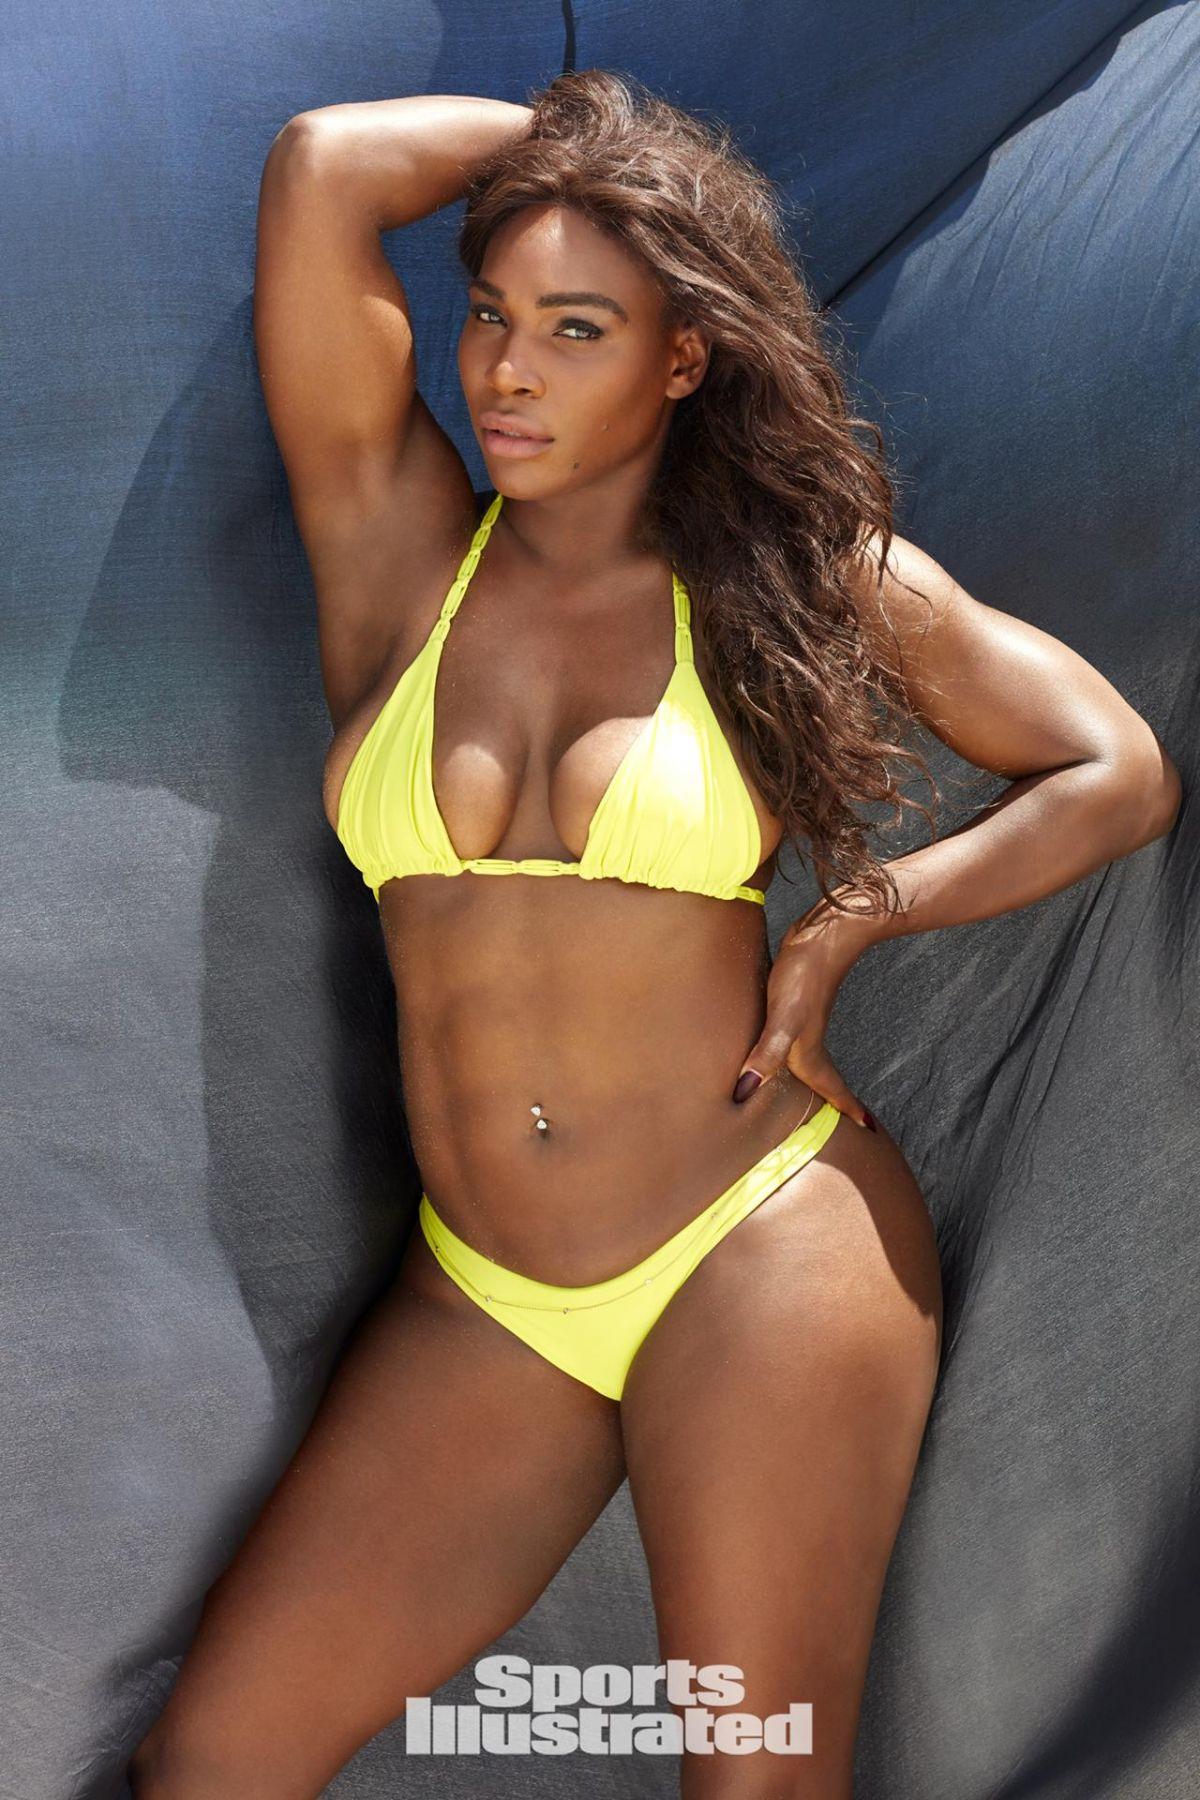 Serena williams sport illustrated swimsuit 2017 2